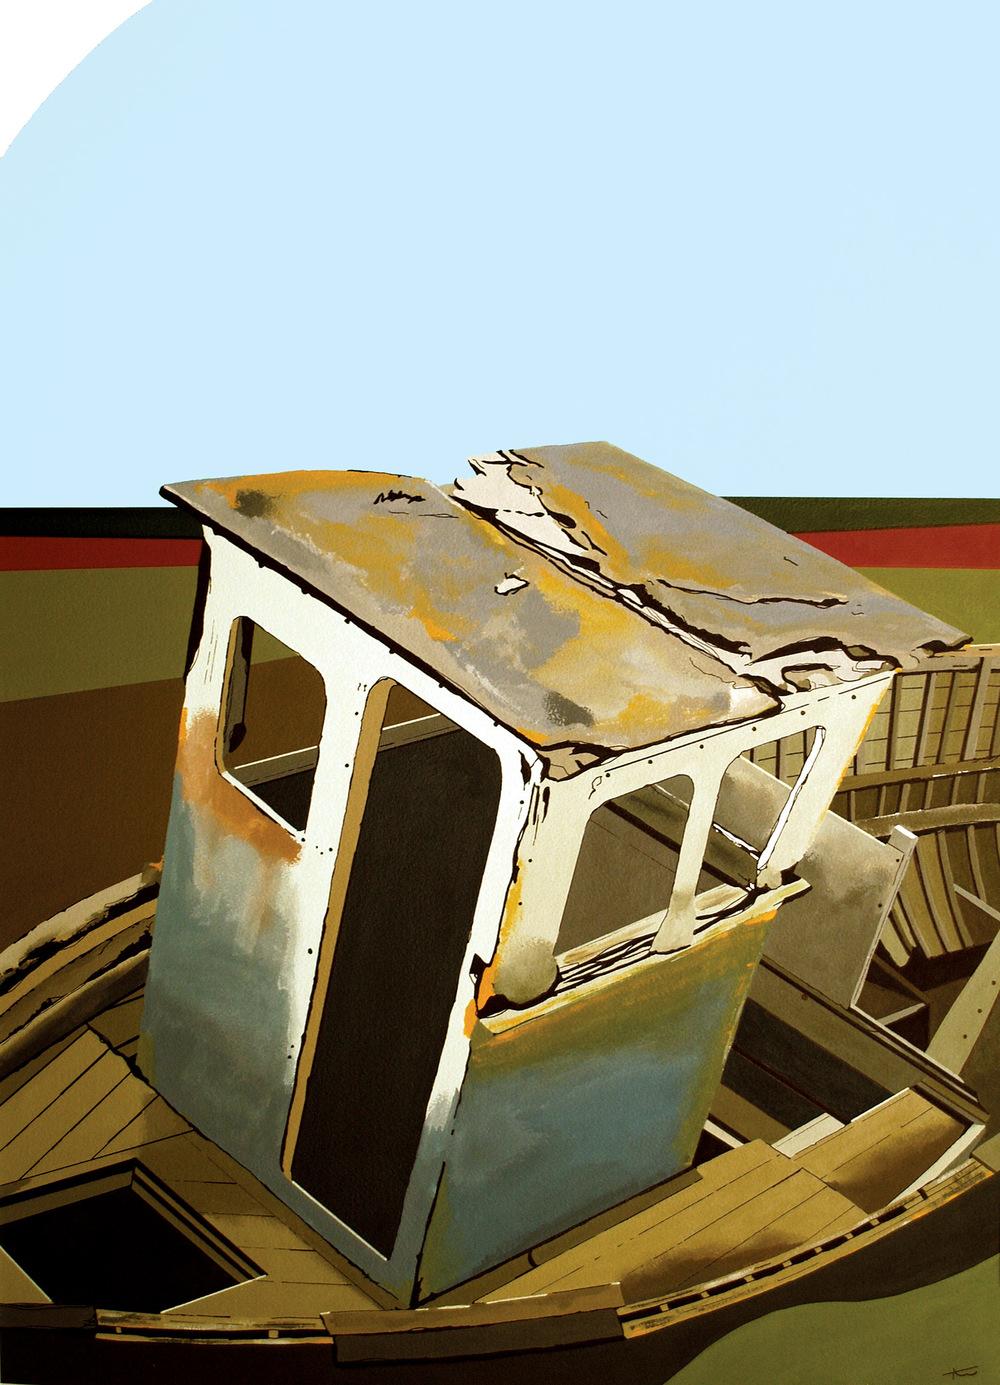 Thornham Boat acrylic & ink